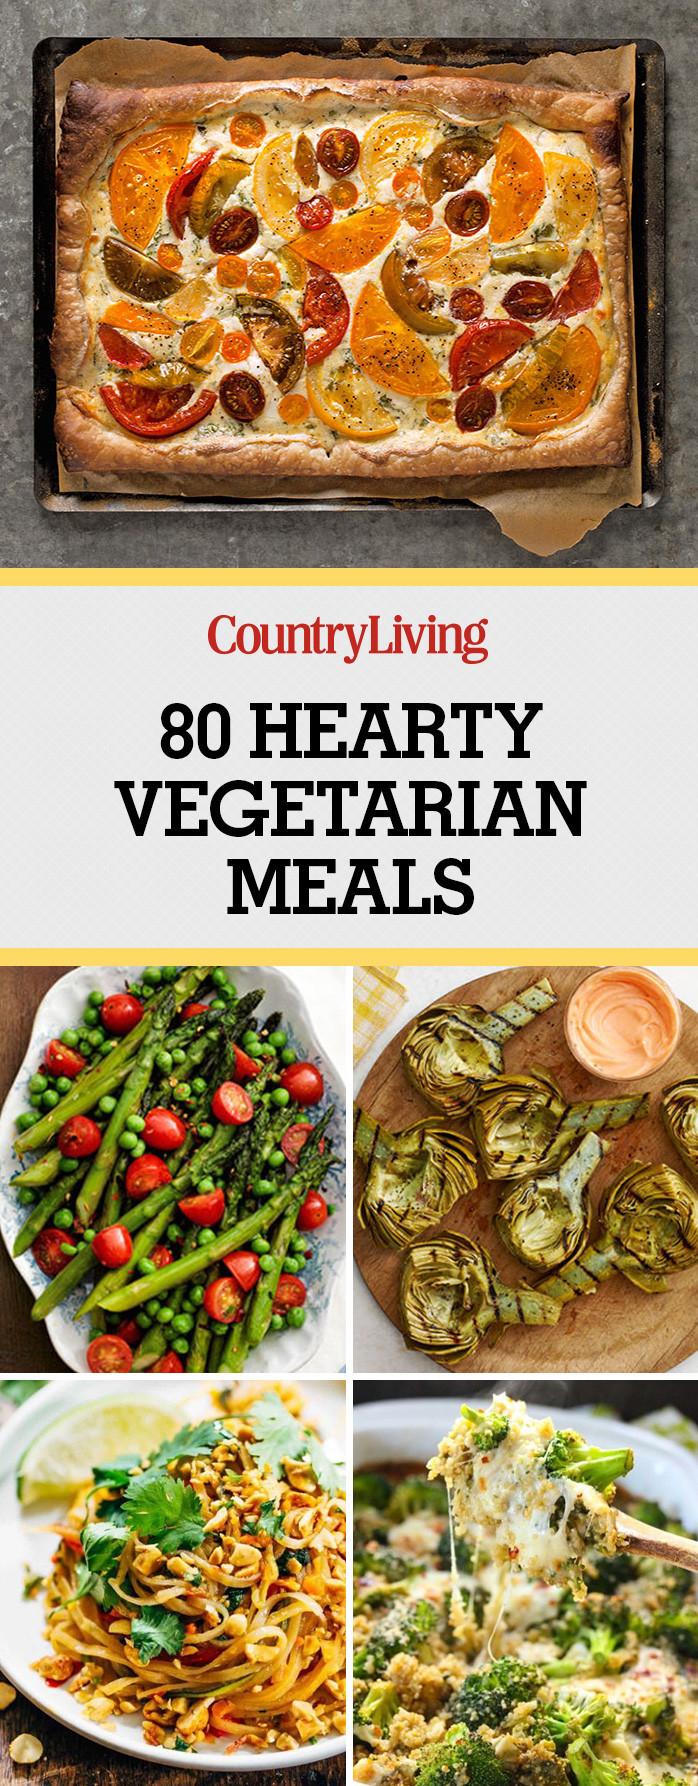 Easy Healthy Vegetarian Dinner Recipes  80 Easy Ve arian Dinner Recipes Best Ve arian Meal